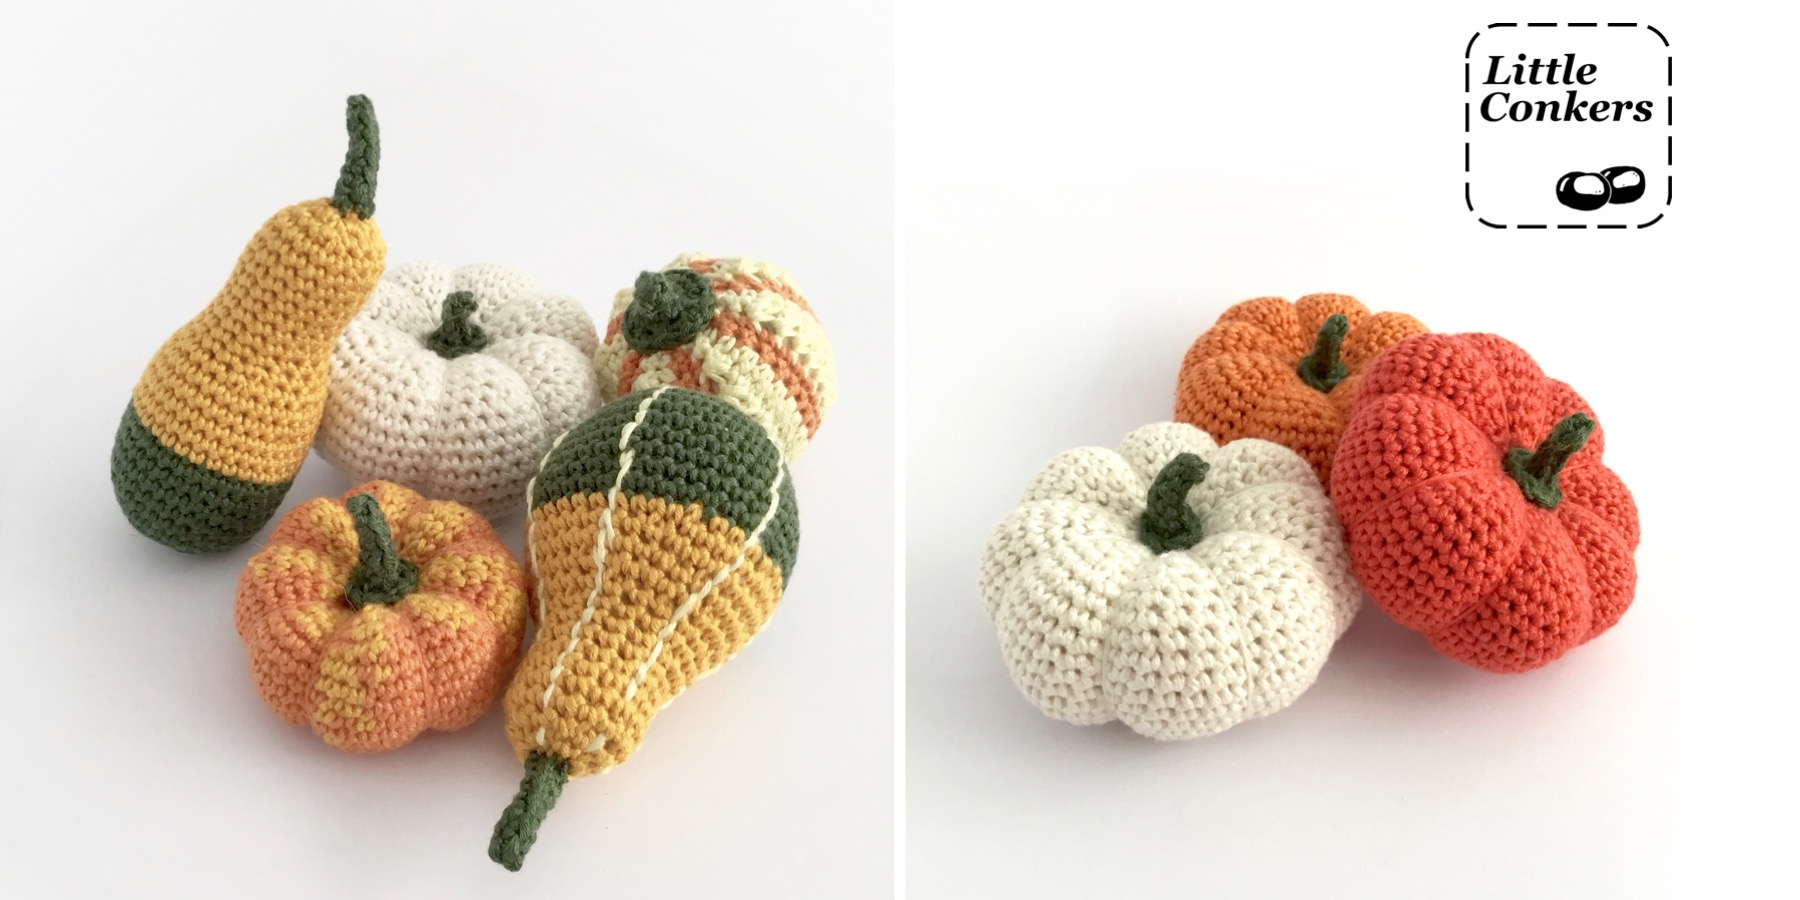 Decorative Gourds and Pumpkins